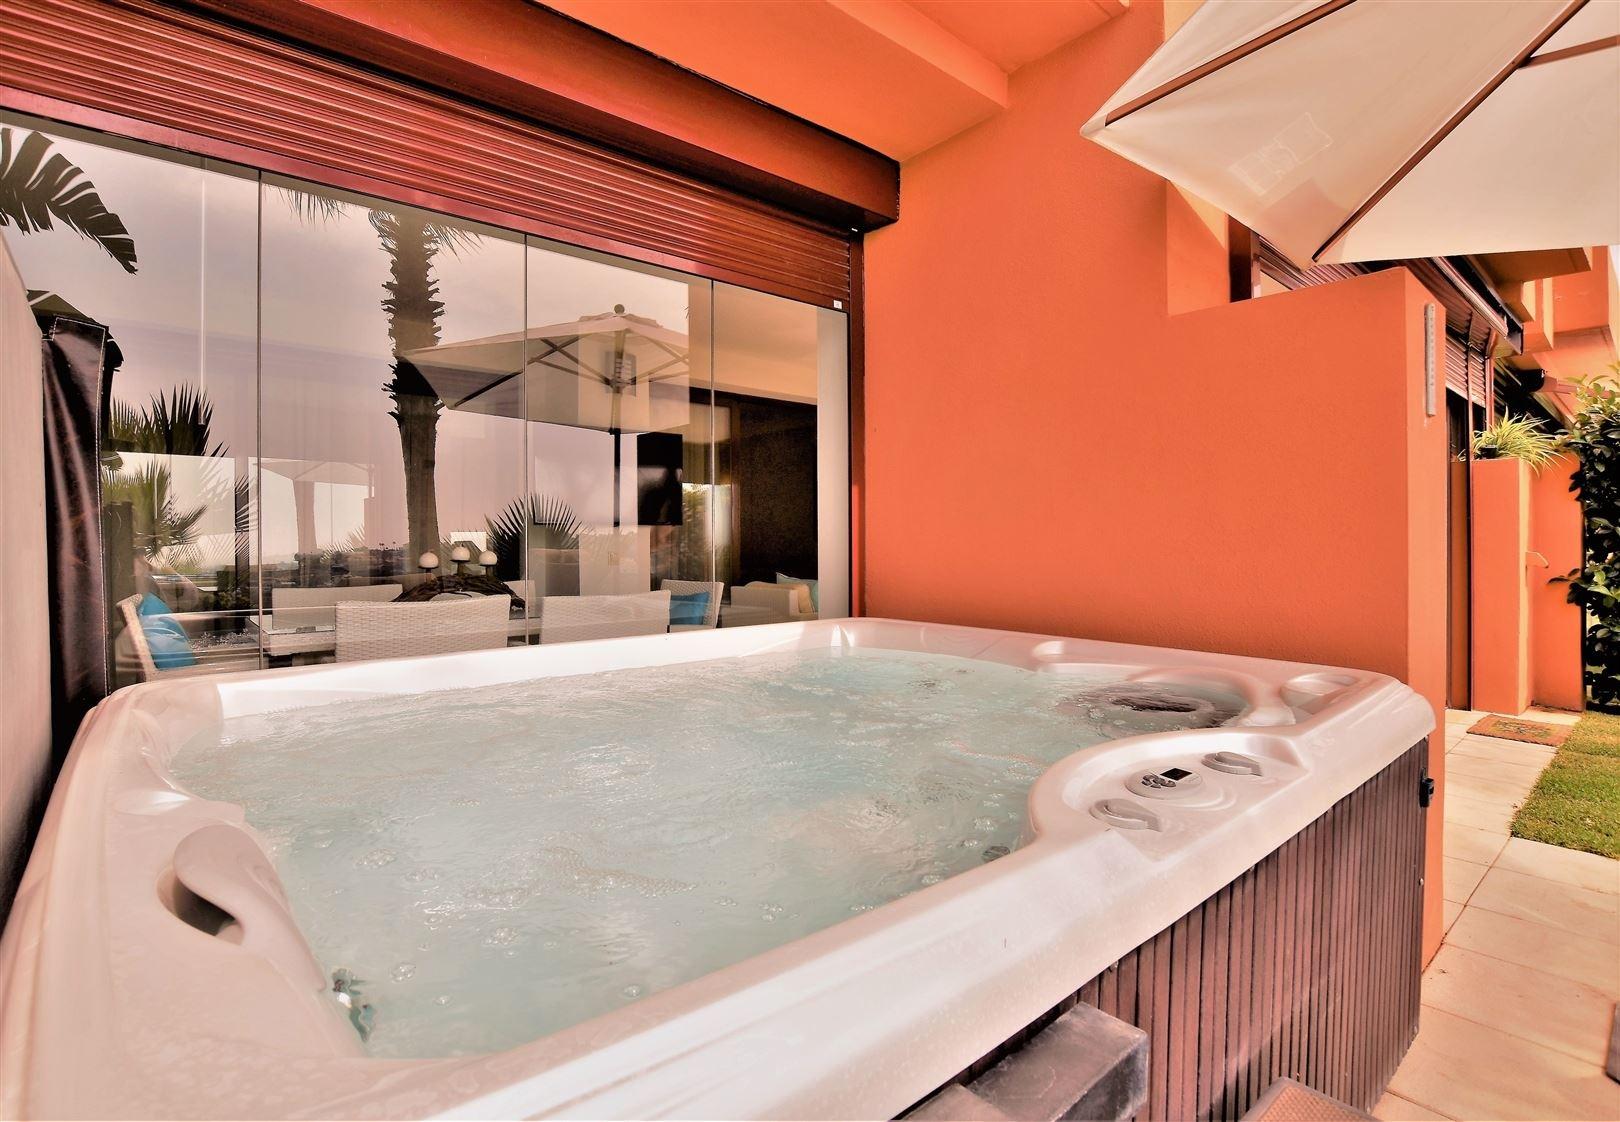 Foto 31 : Appartement te 29679 MARBELLA (Spanje) - Prijs € 1.750